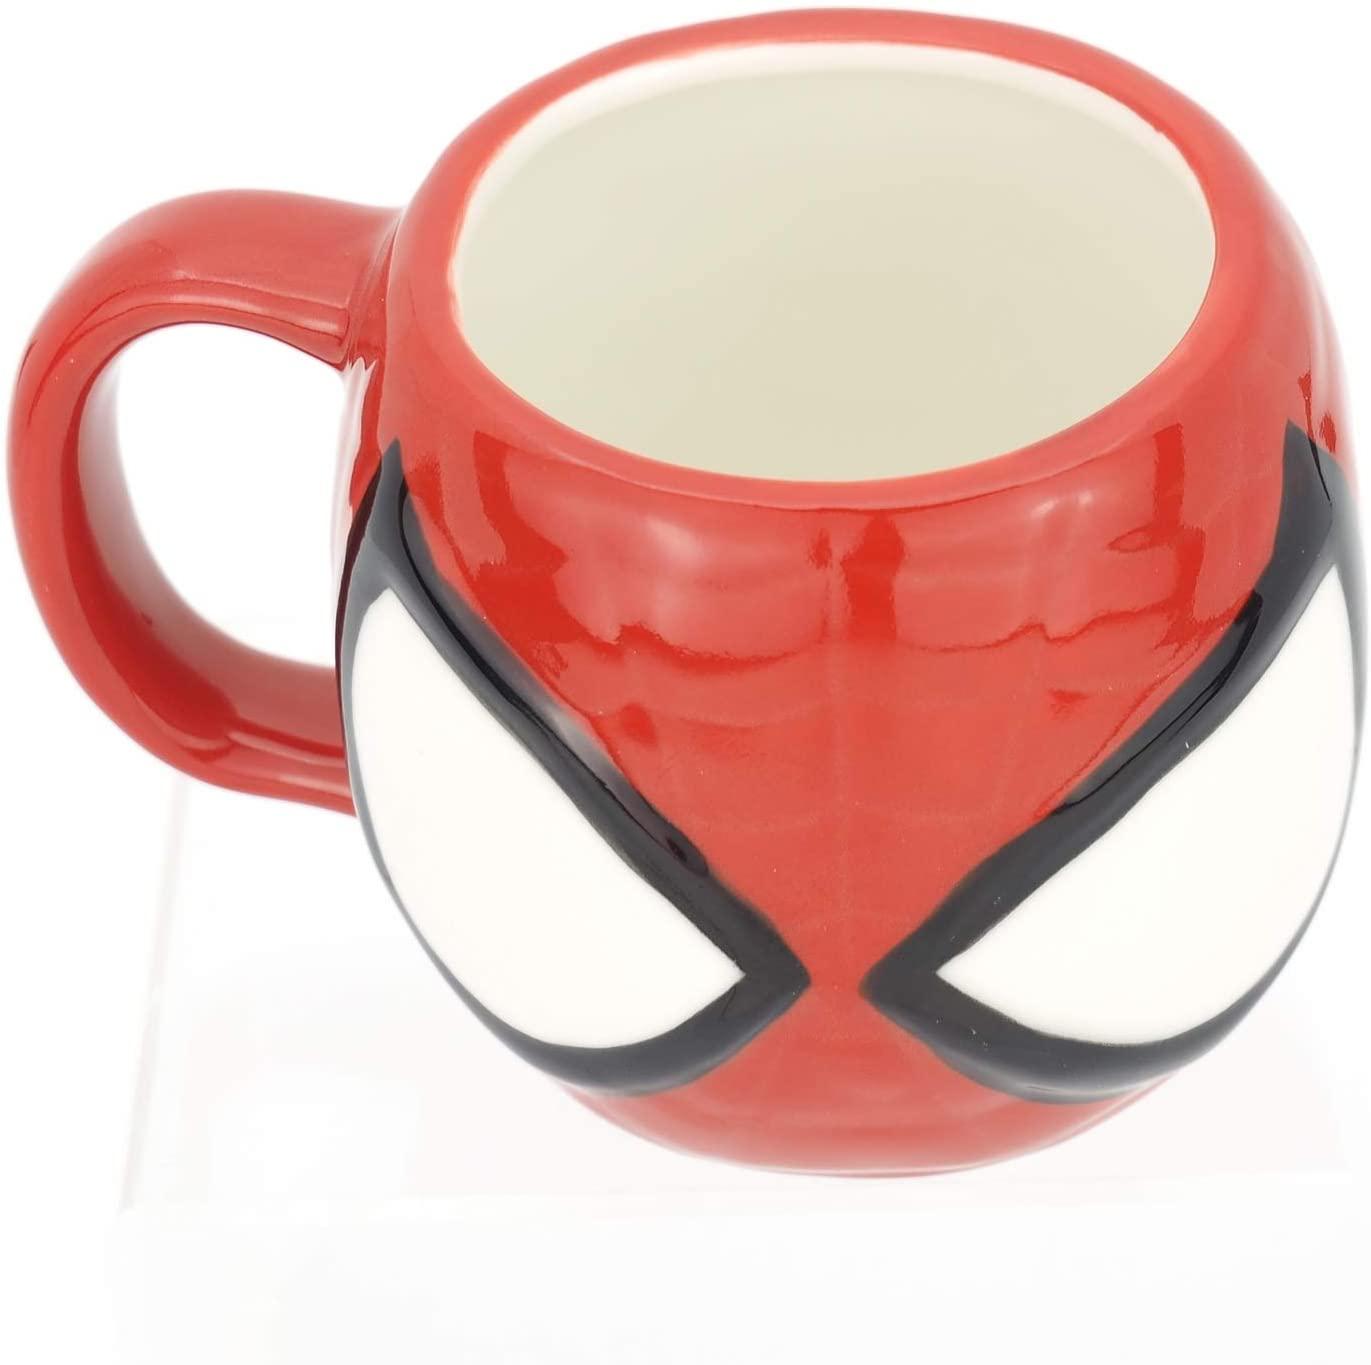 Marvel復仇者聯盟造型馬克杯270ml-蜘蛛人Spider-Man,水杯/馬克杯/杯瓶/茶具/玻璃杯/不鏽鋼杯,X射線【C248279】